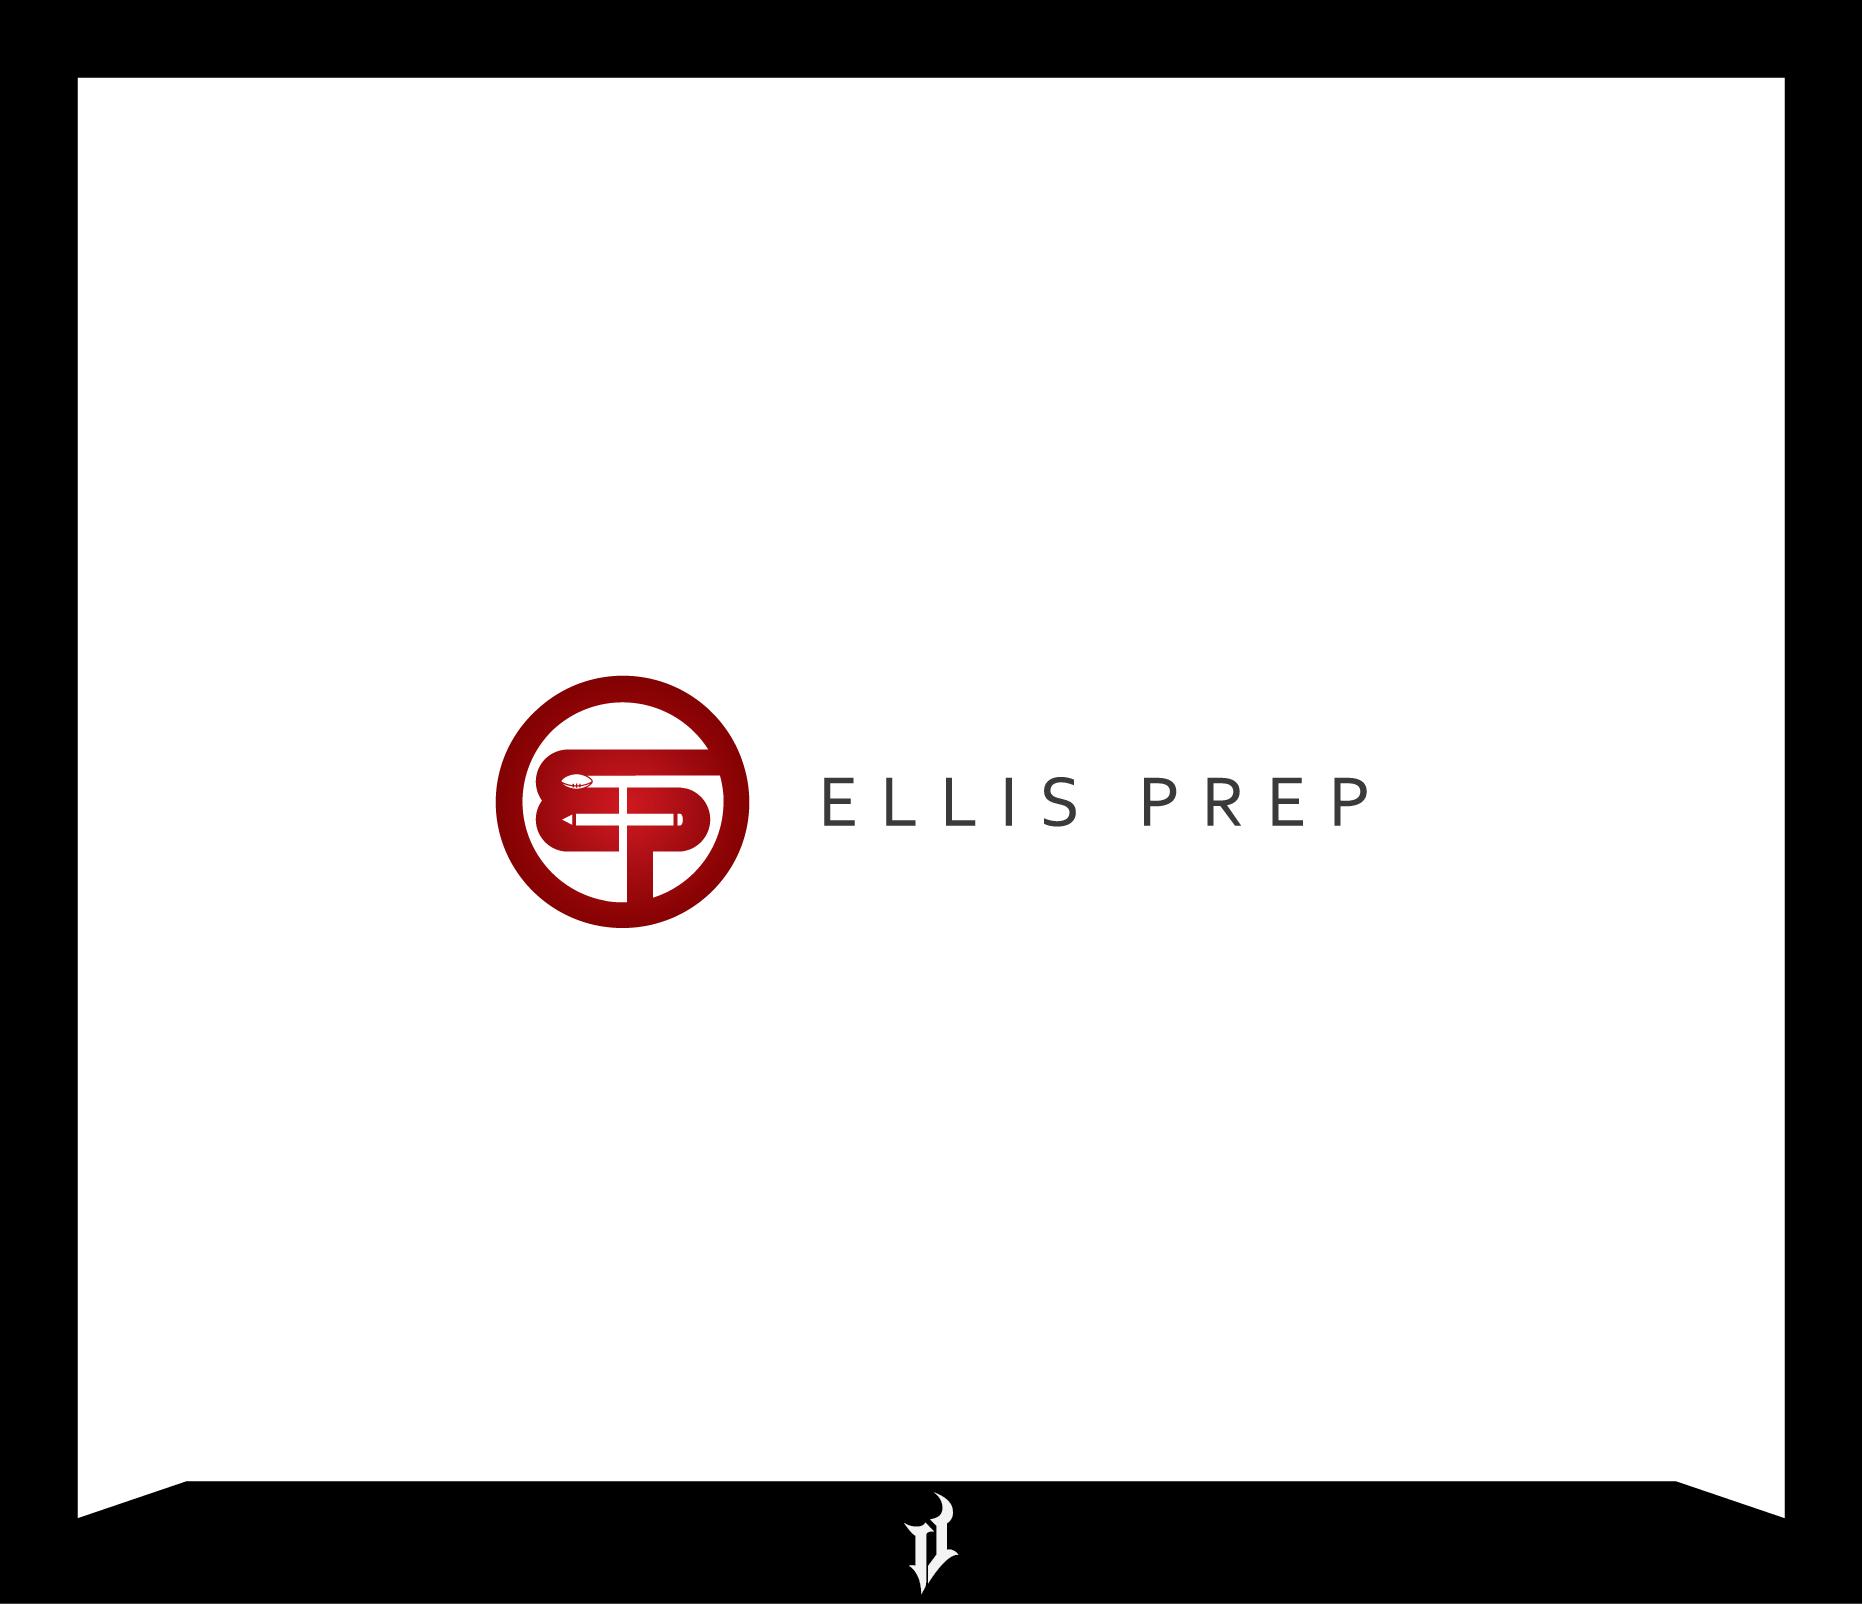 Help Ellis Prep with a new logo